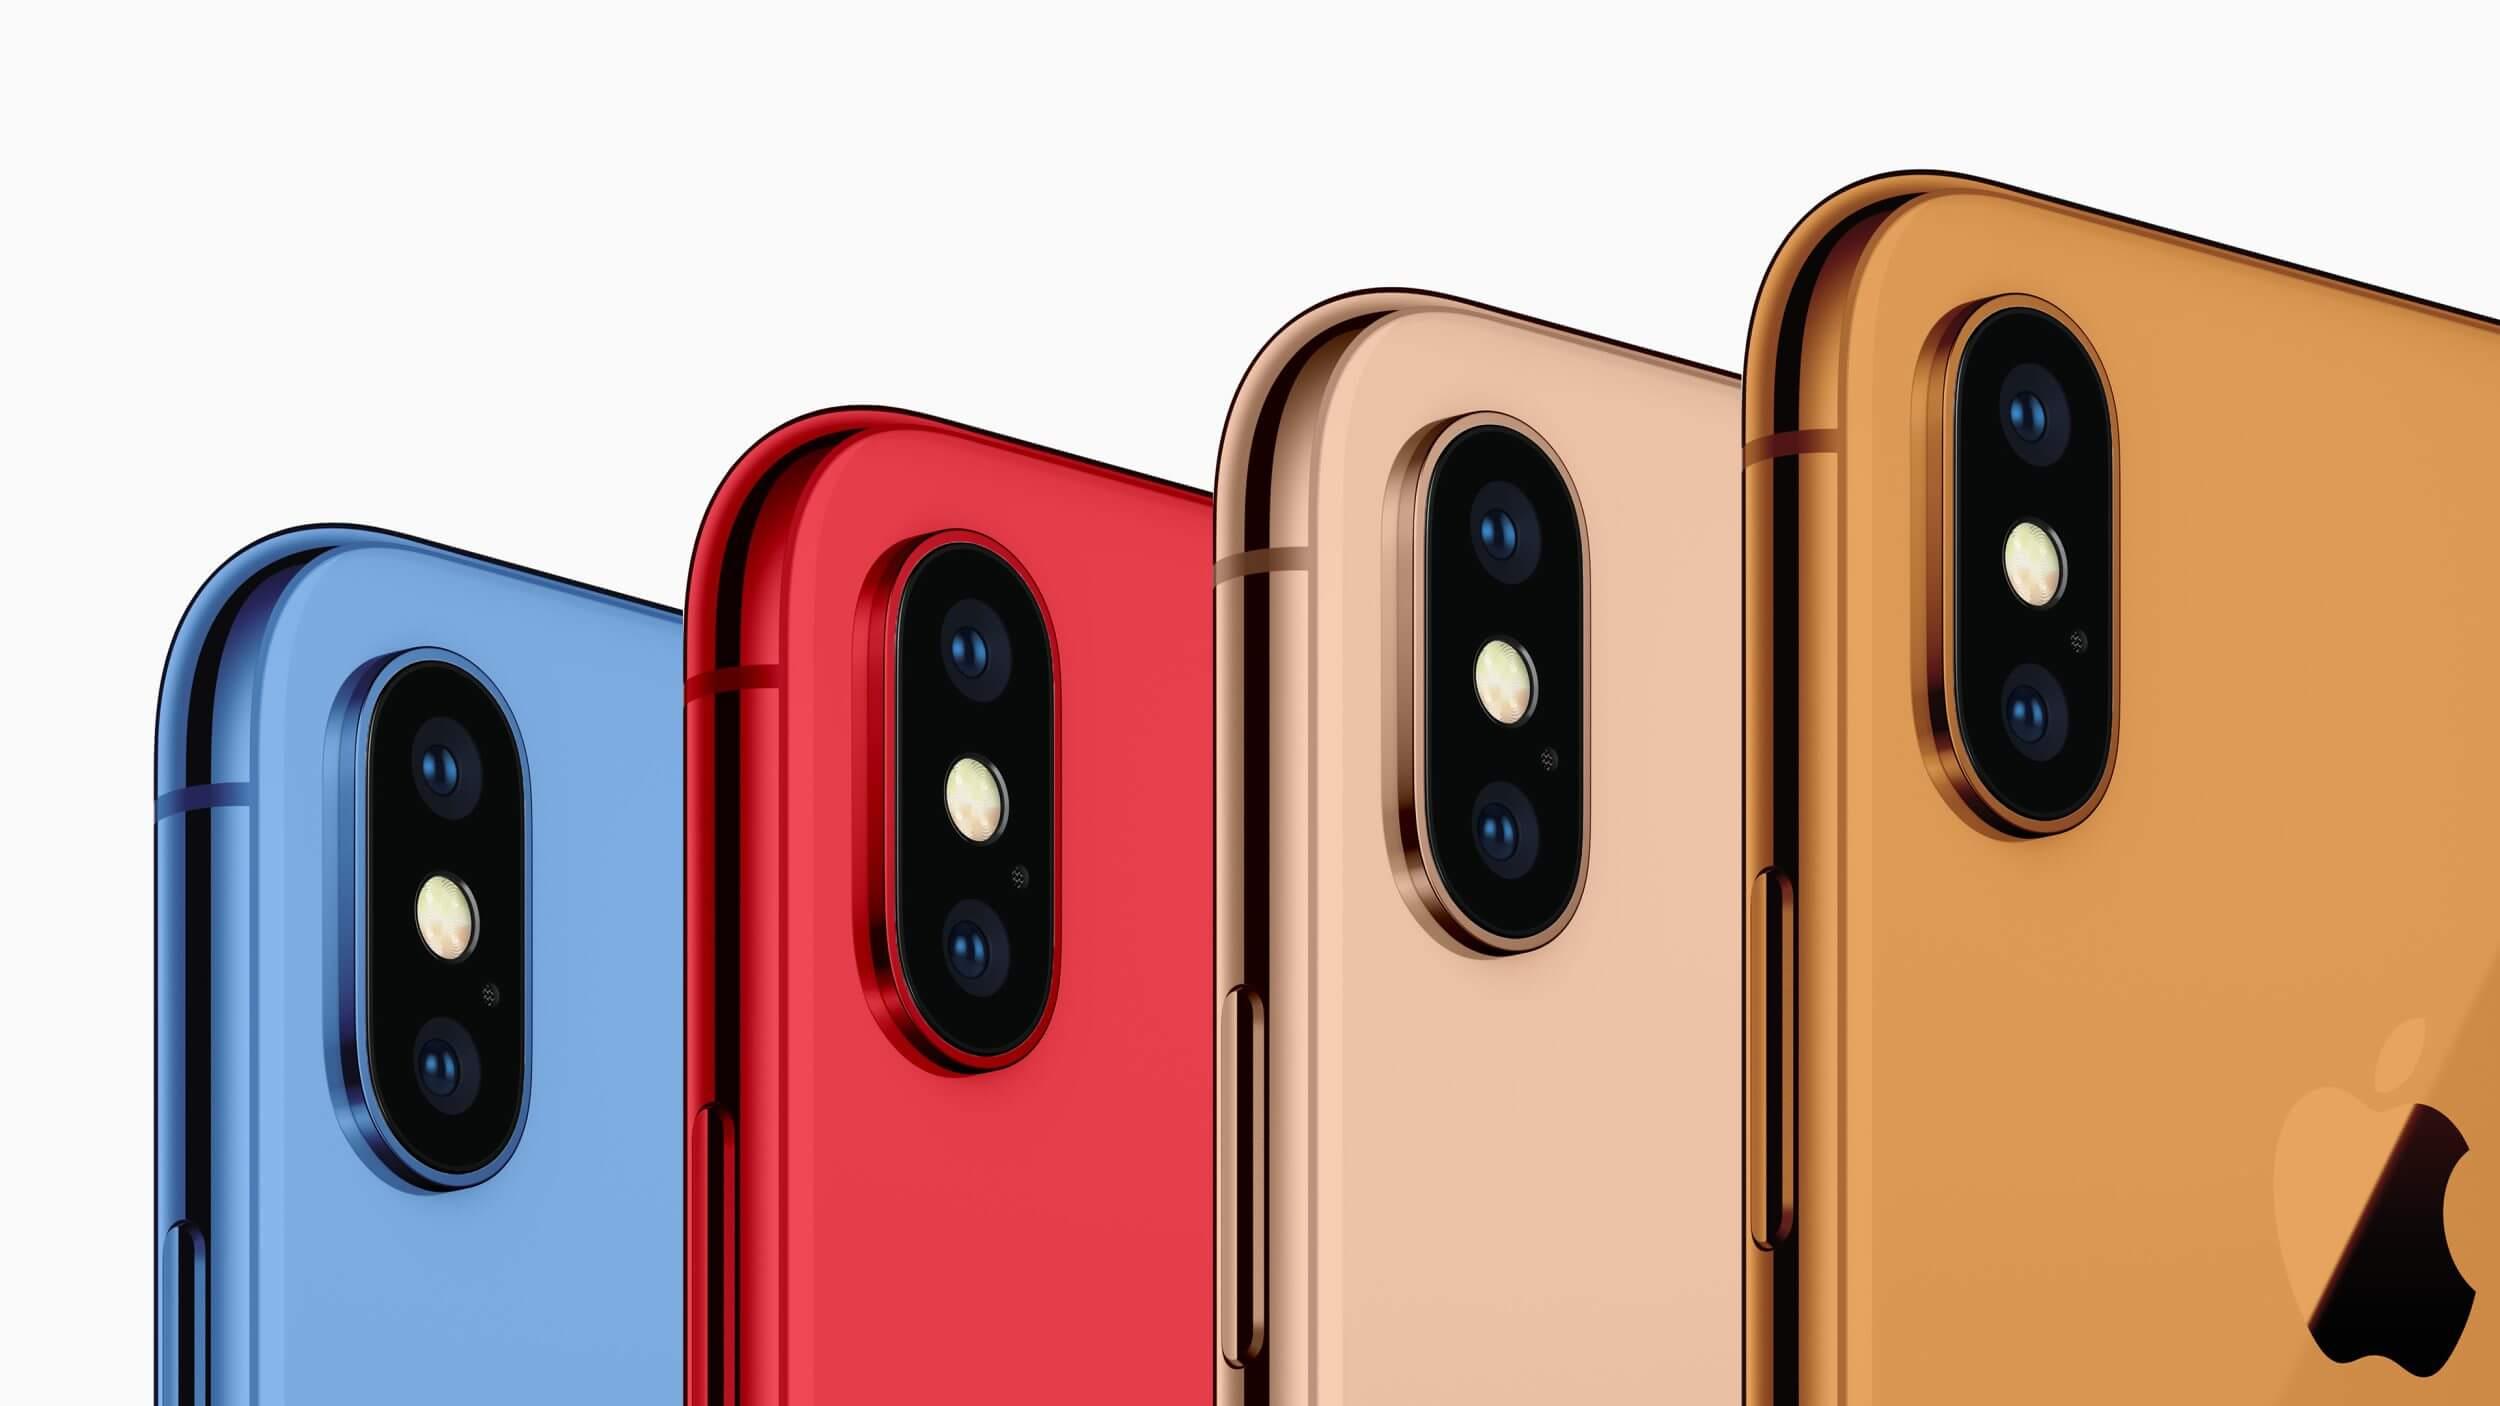 iPhone 2018 Farbvarianten